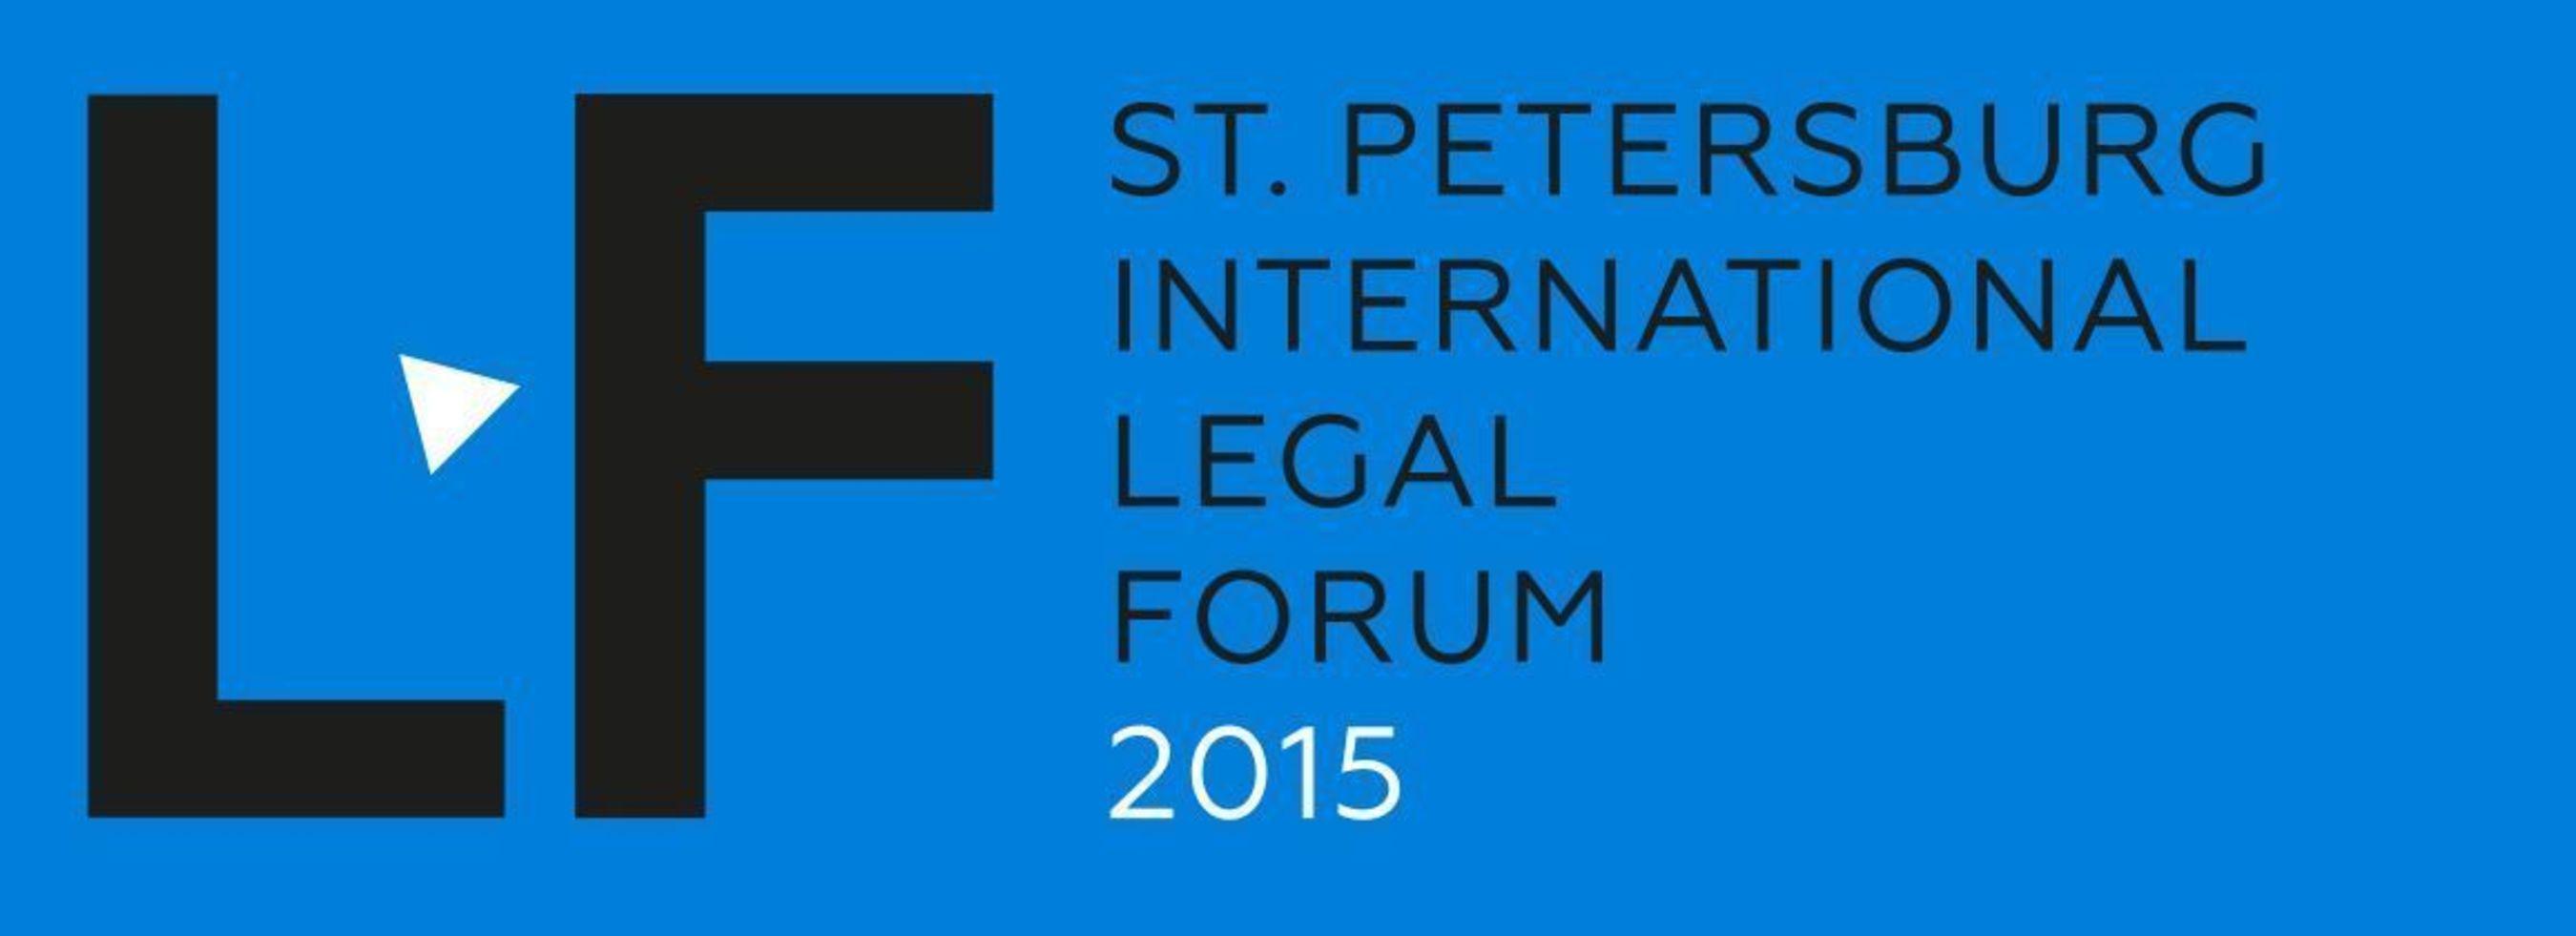 St Petersburg International Legal Forum Logo (PRNewsFoto/International Legal Forum)